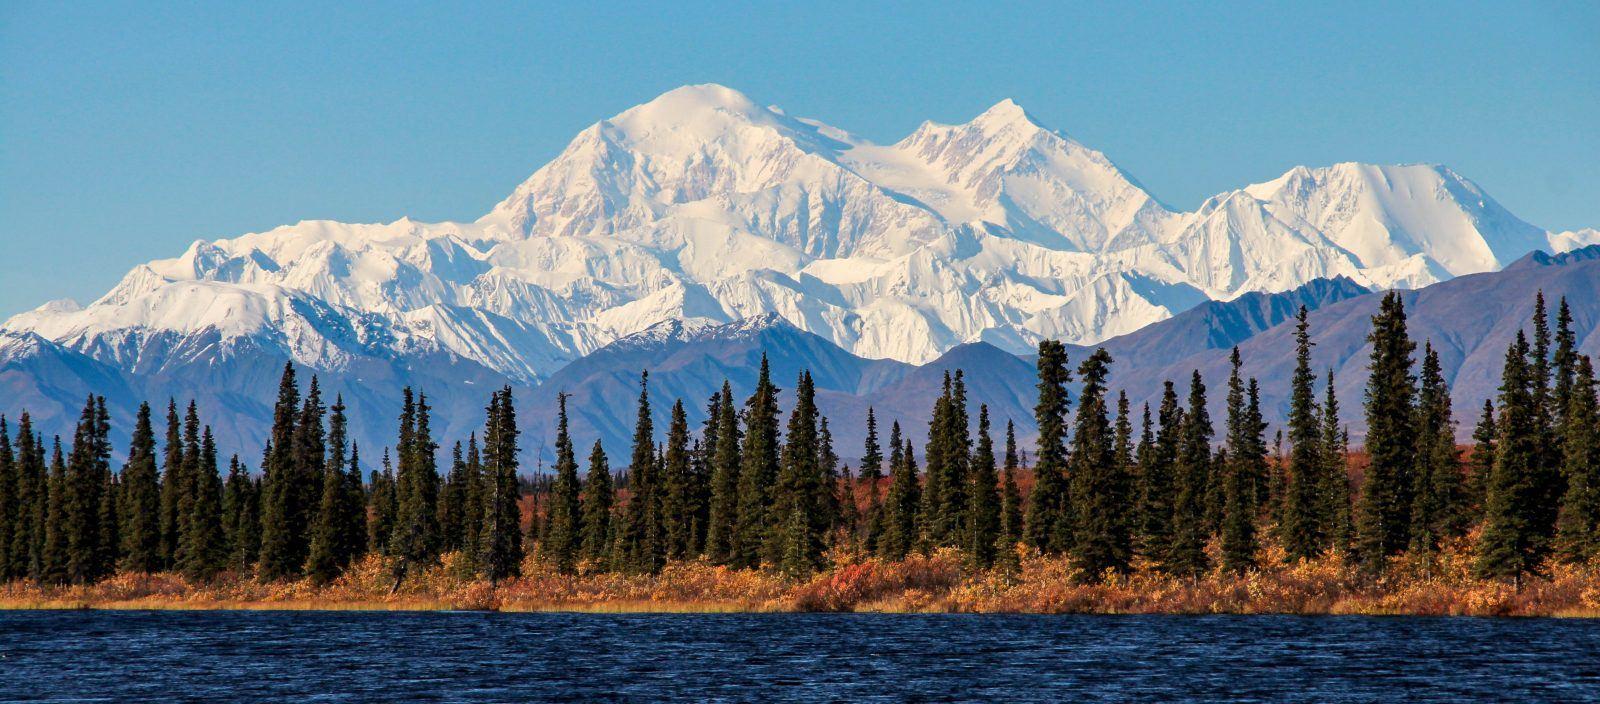 Alaska: Denali to Kenai Fjords